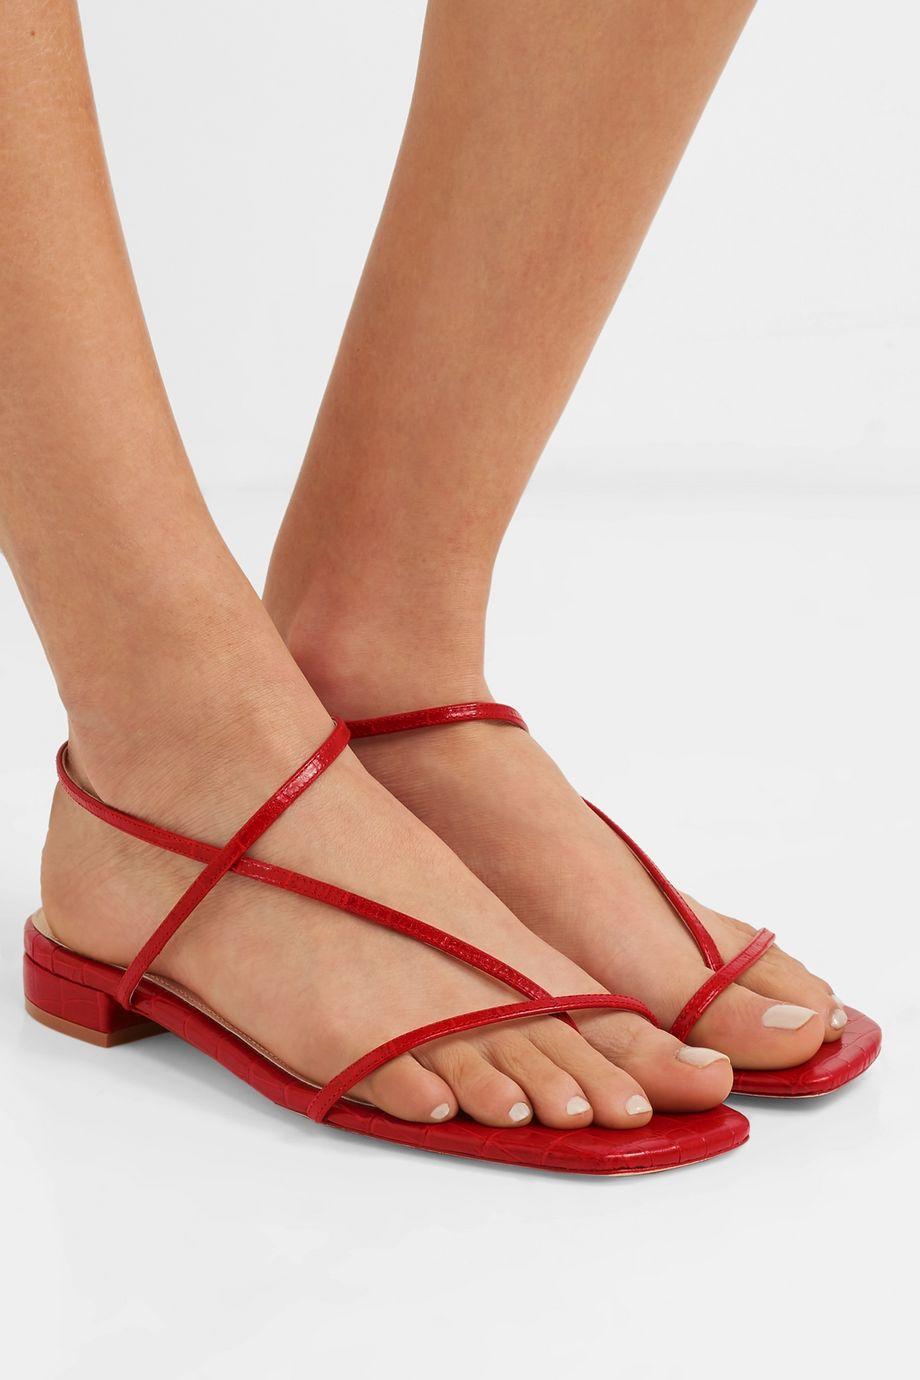 STUDIO AMELIA 1.2 croc-effect leather sandals